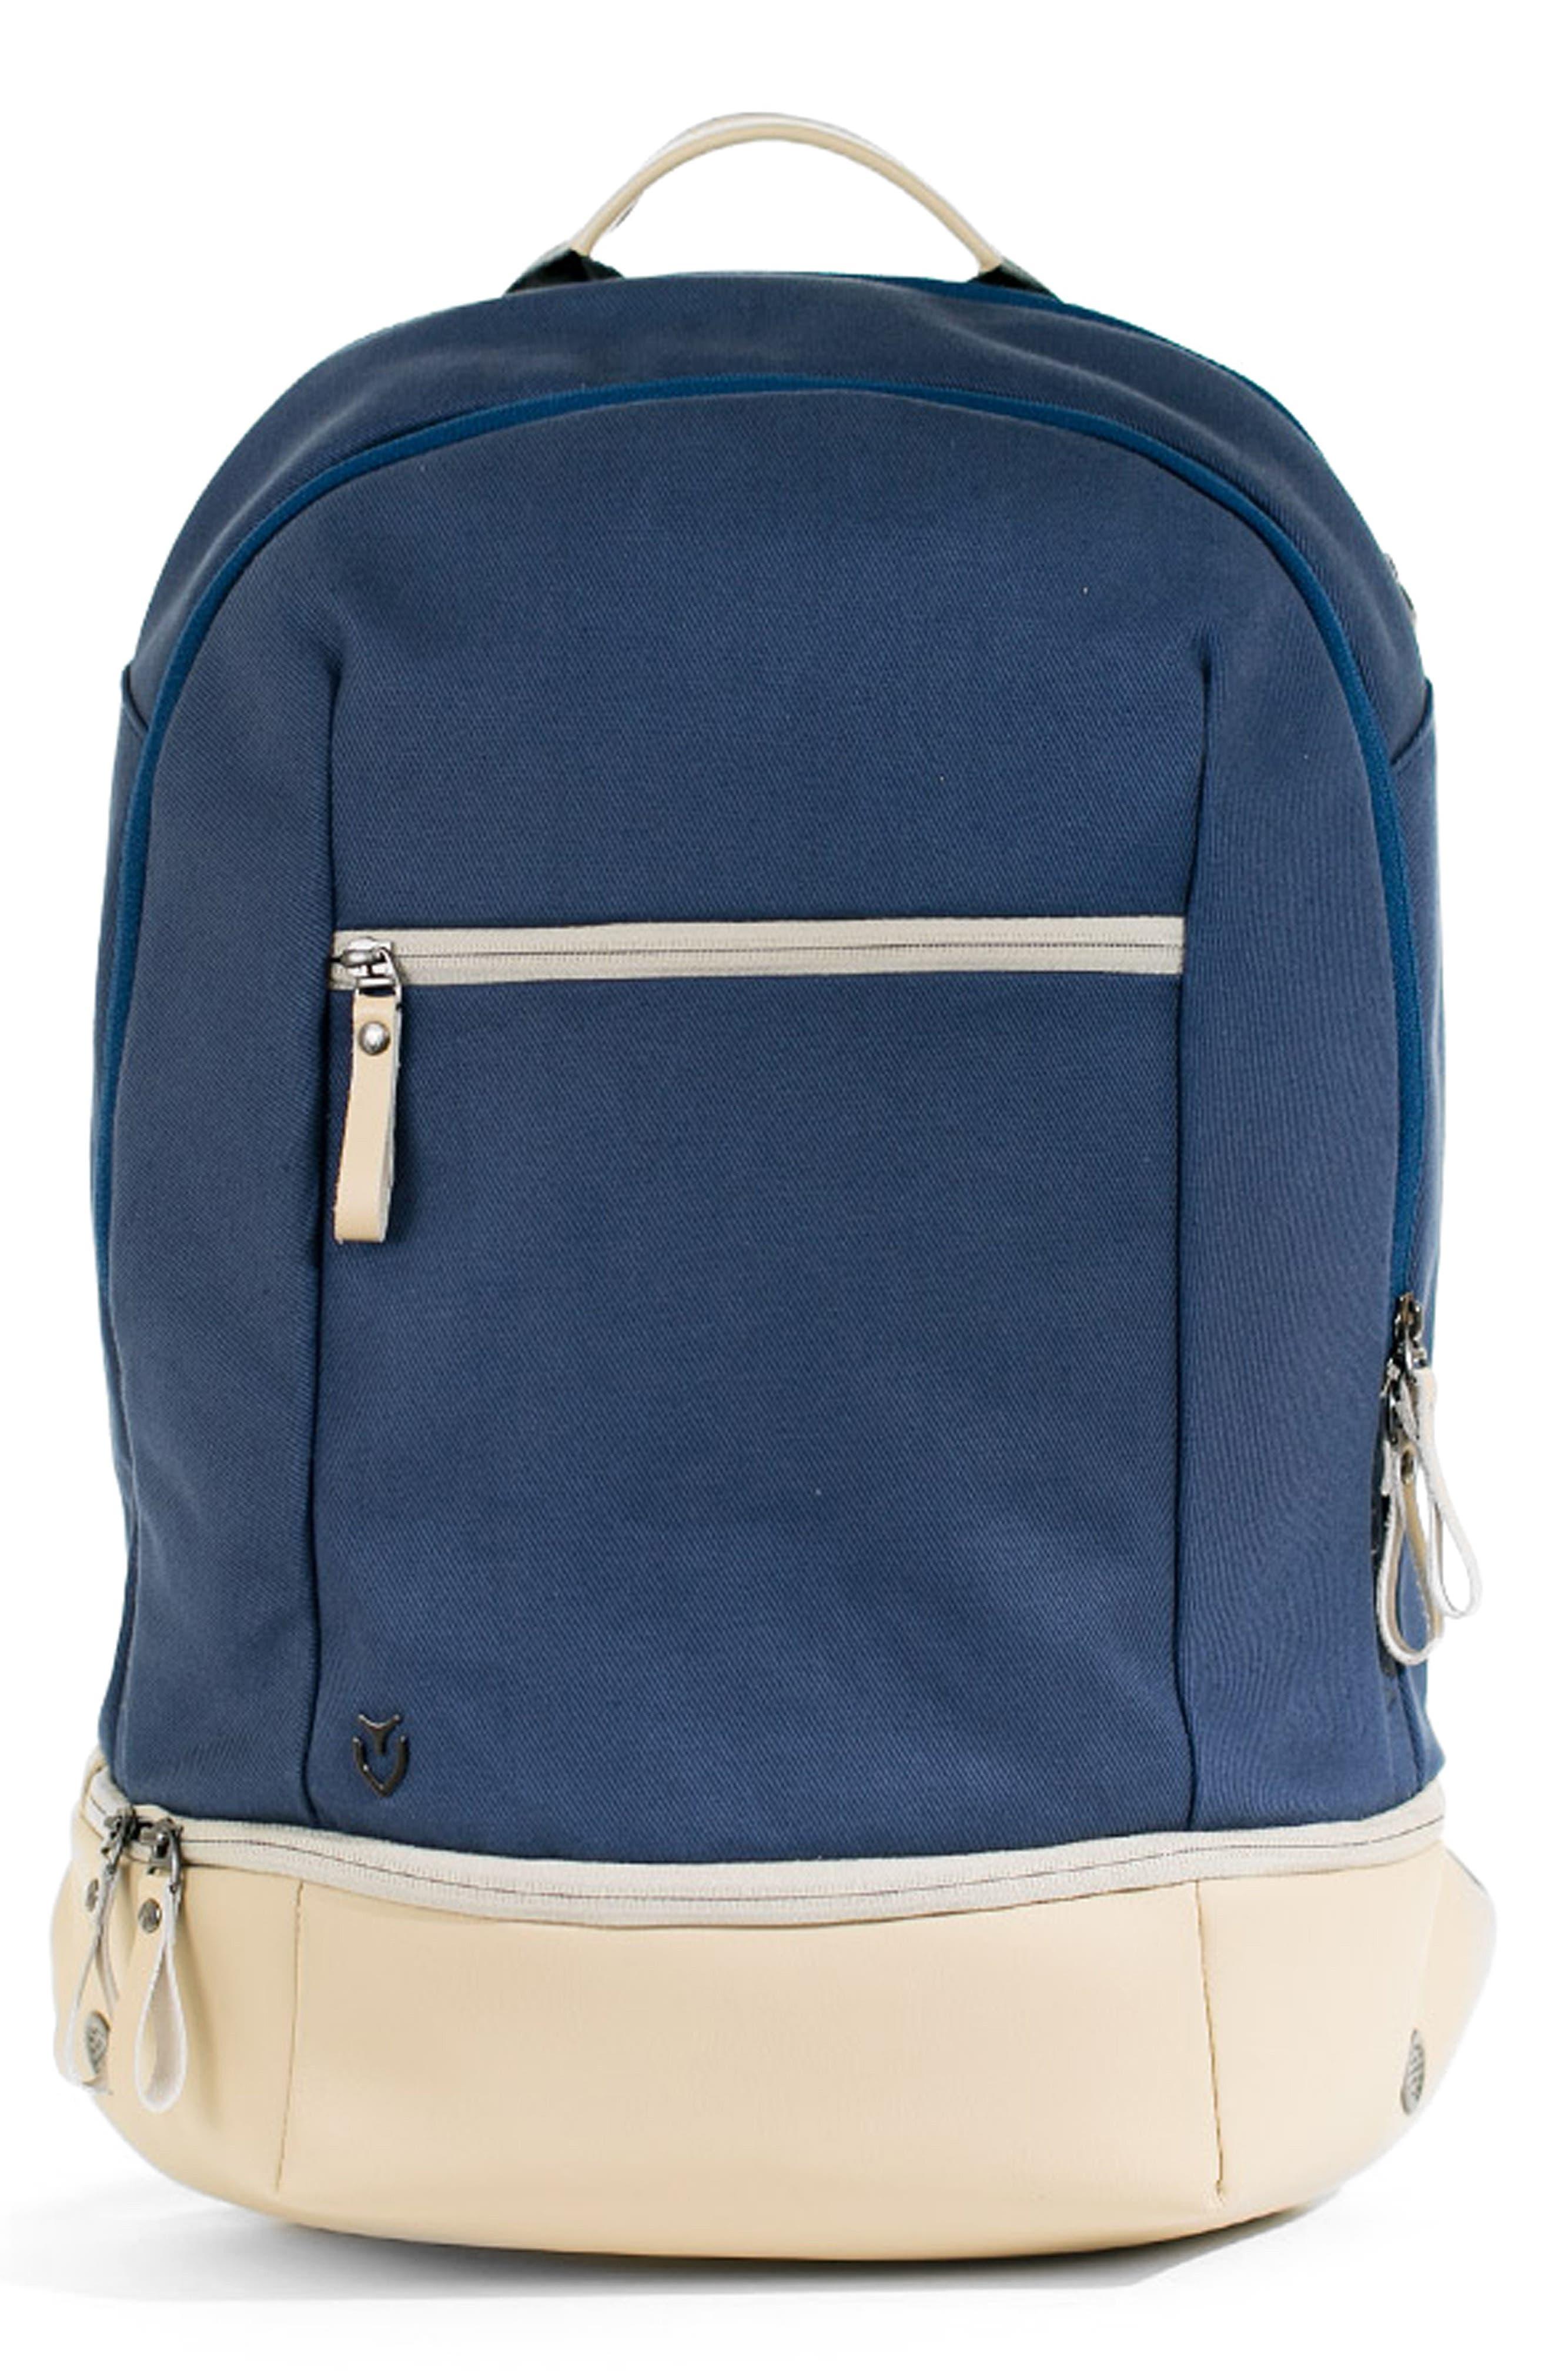 Alternate Image 1 Selected - Vessel Signature Backpack